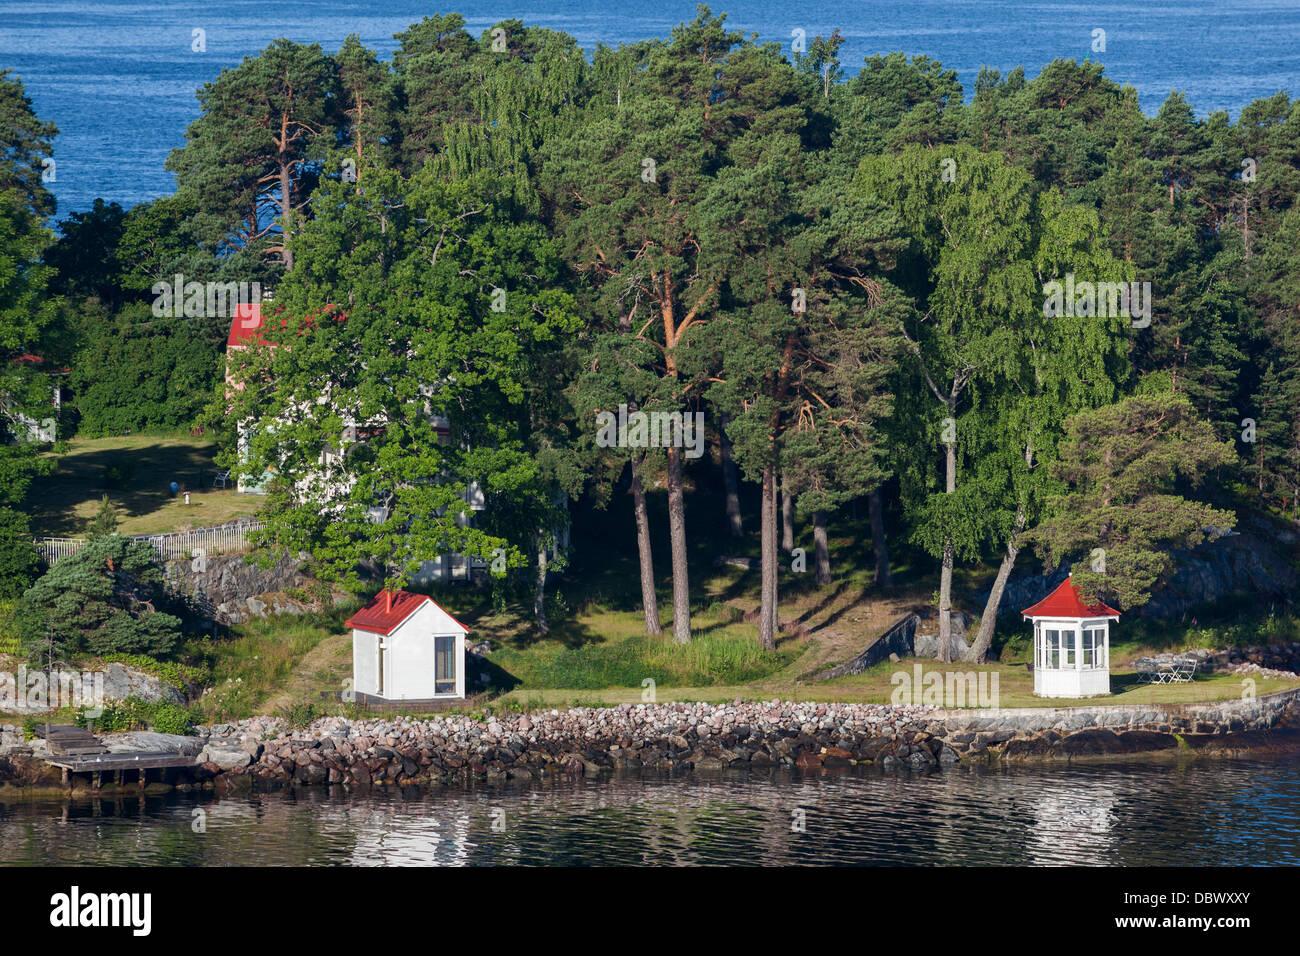 Stockholm archipelago. Sweden. Stock Photo